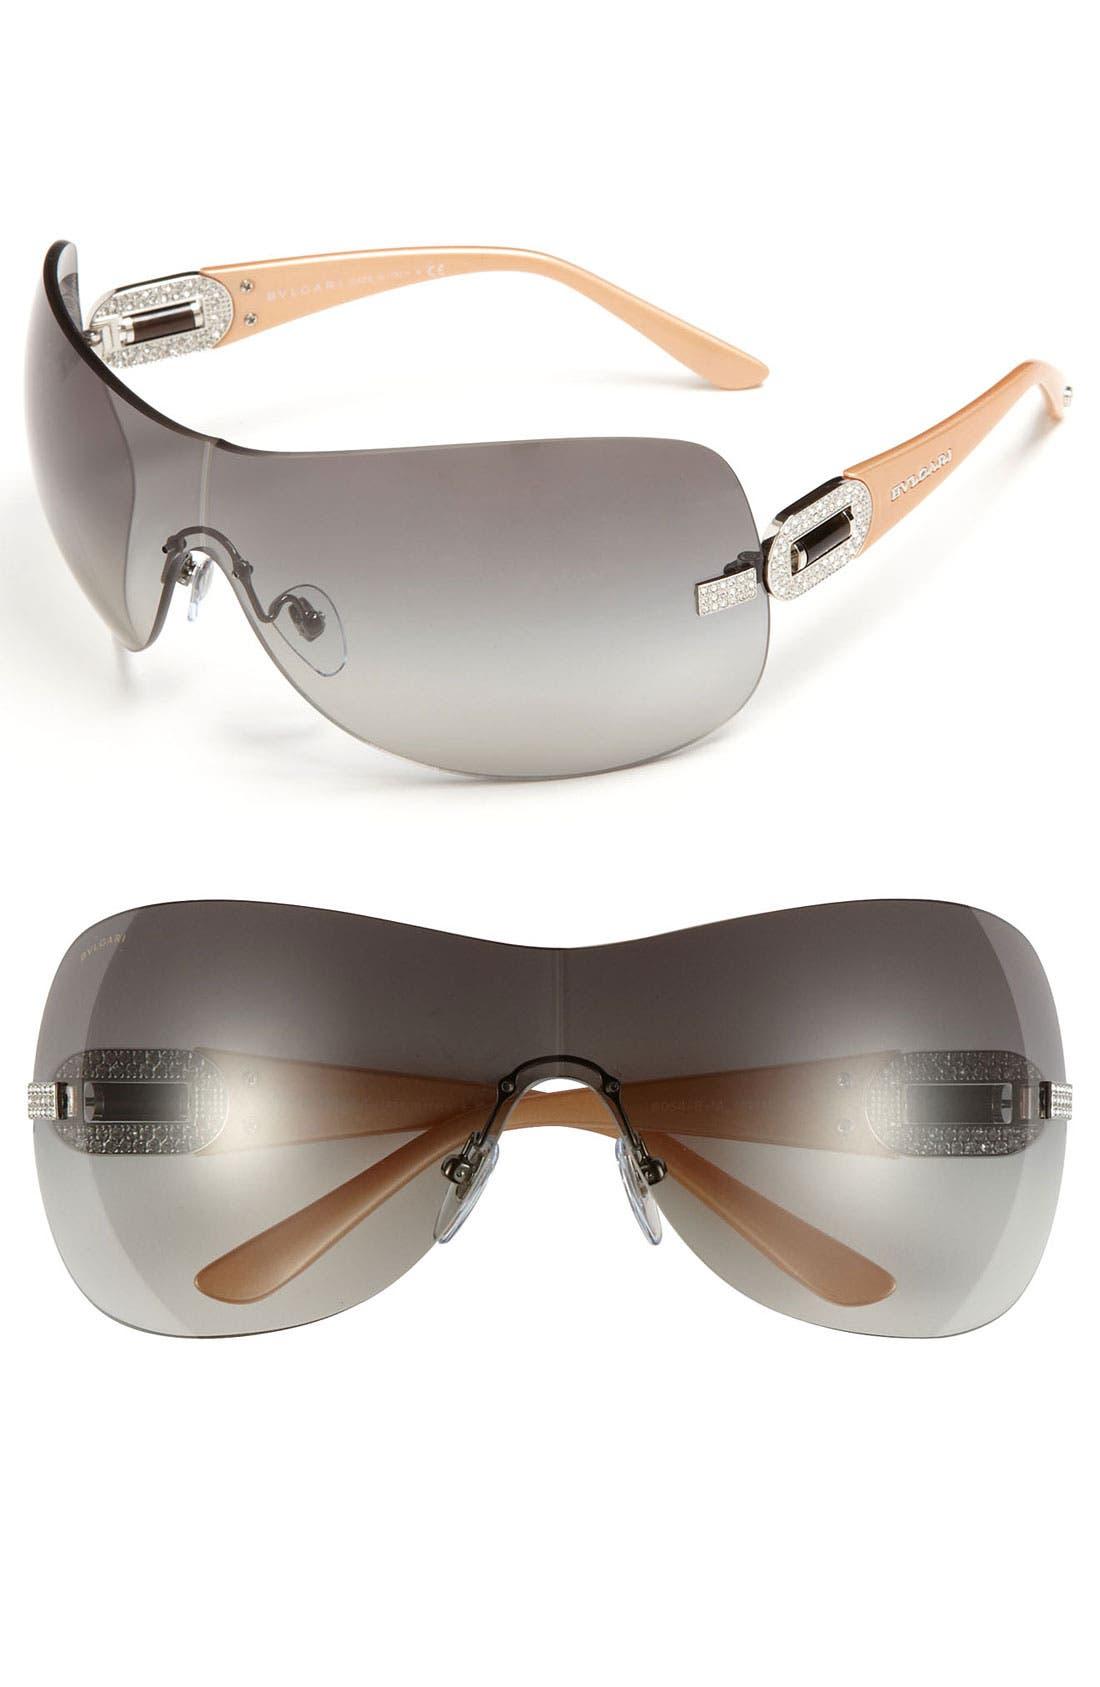 Alternate Image 1 Selected - BVLGARI 'Icona' Shield Sunglasses